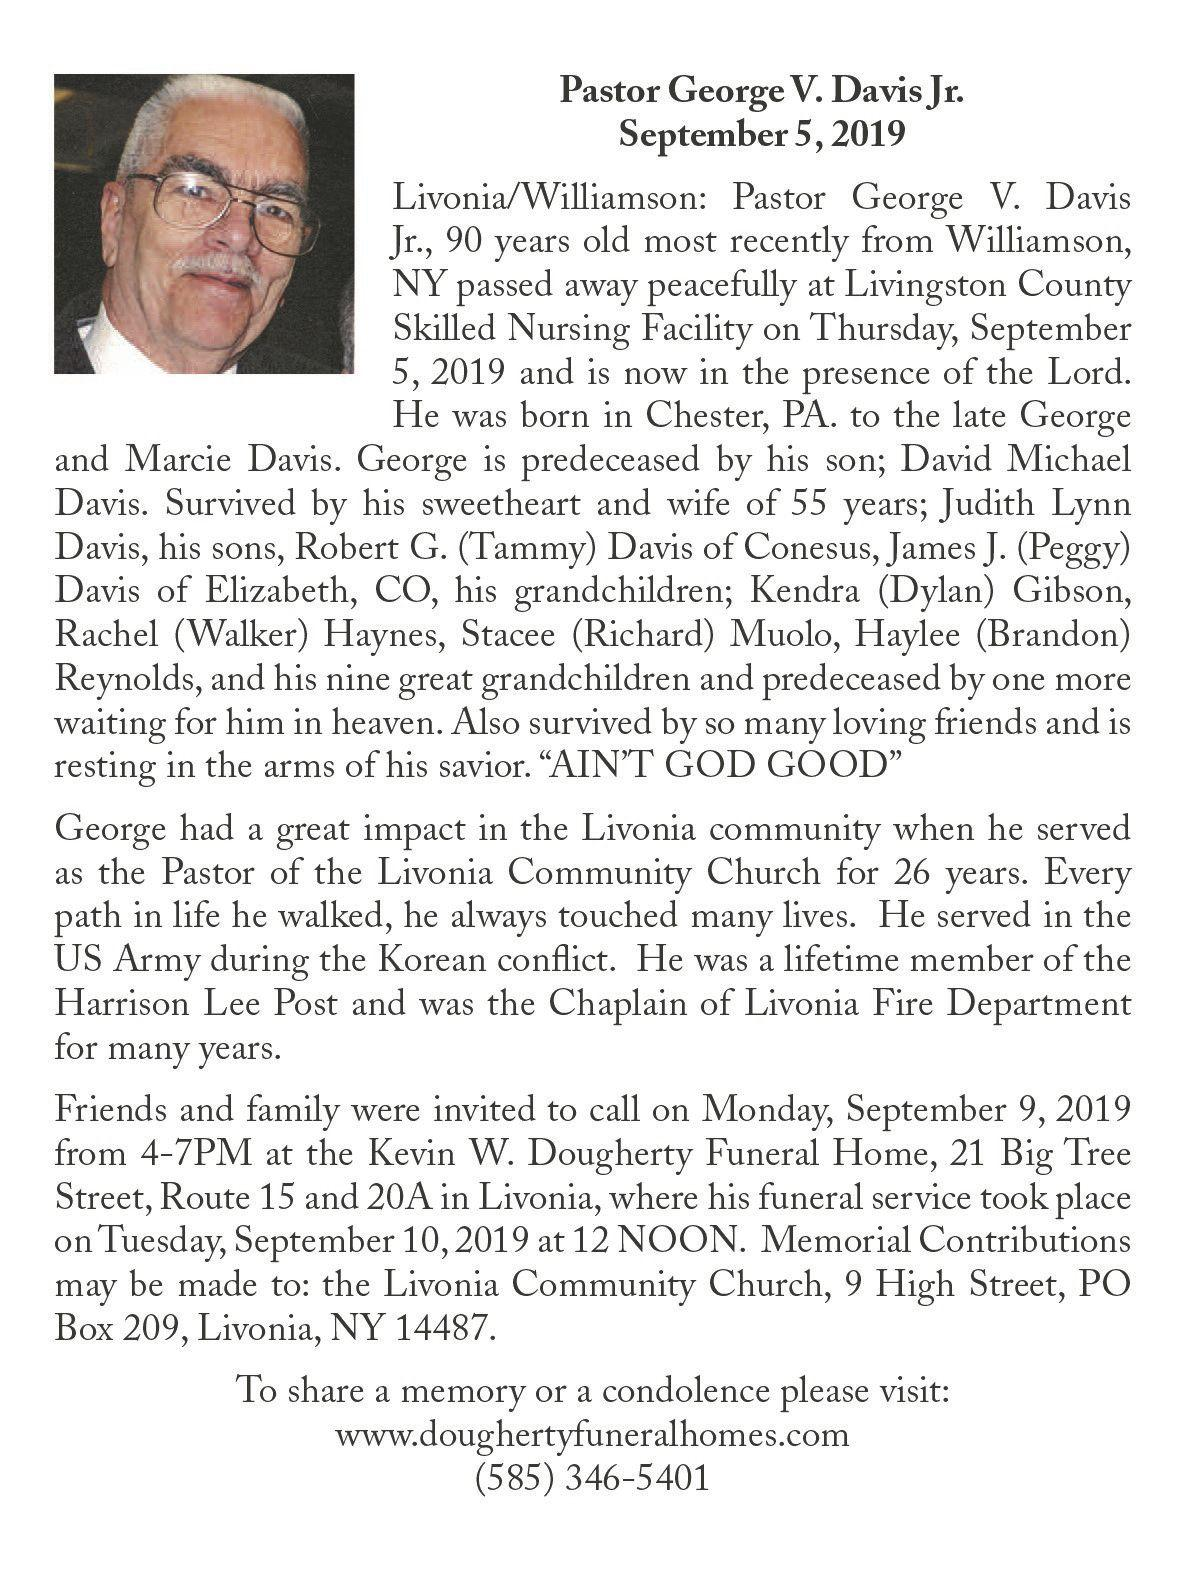 Pastor George V. Davis Jr. ~ September 5, 2019